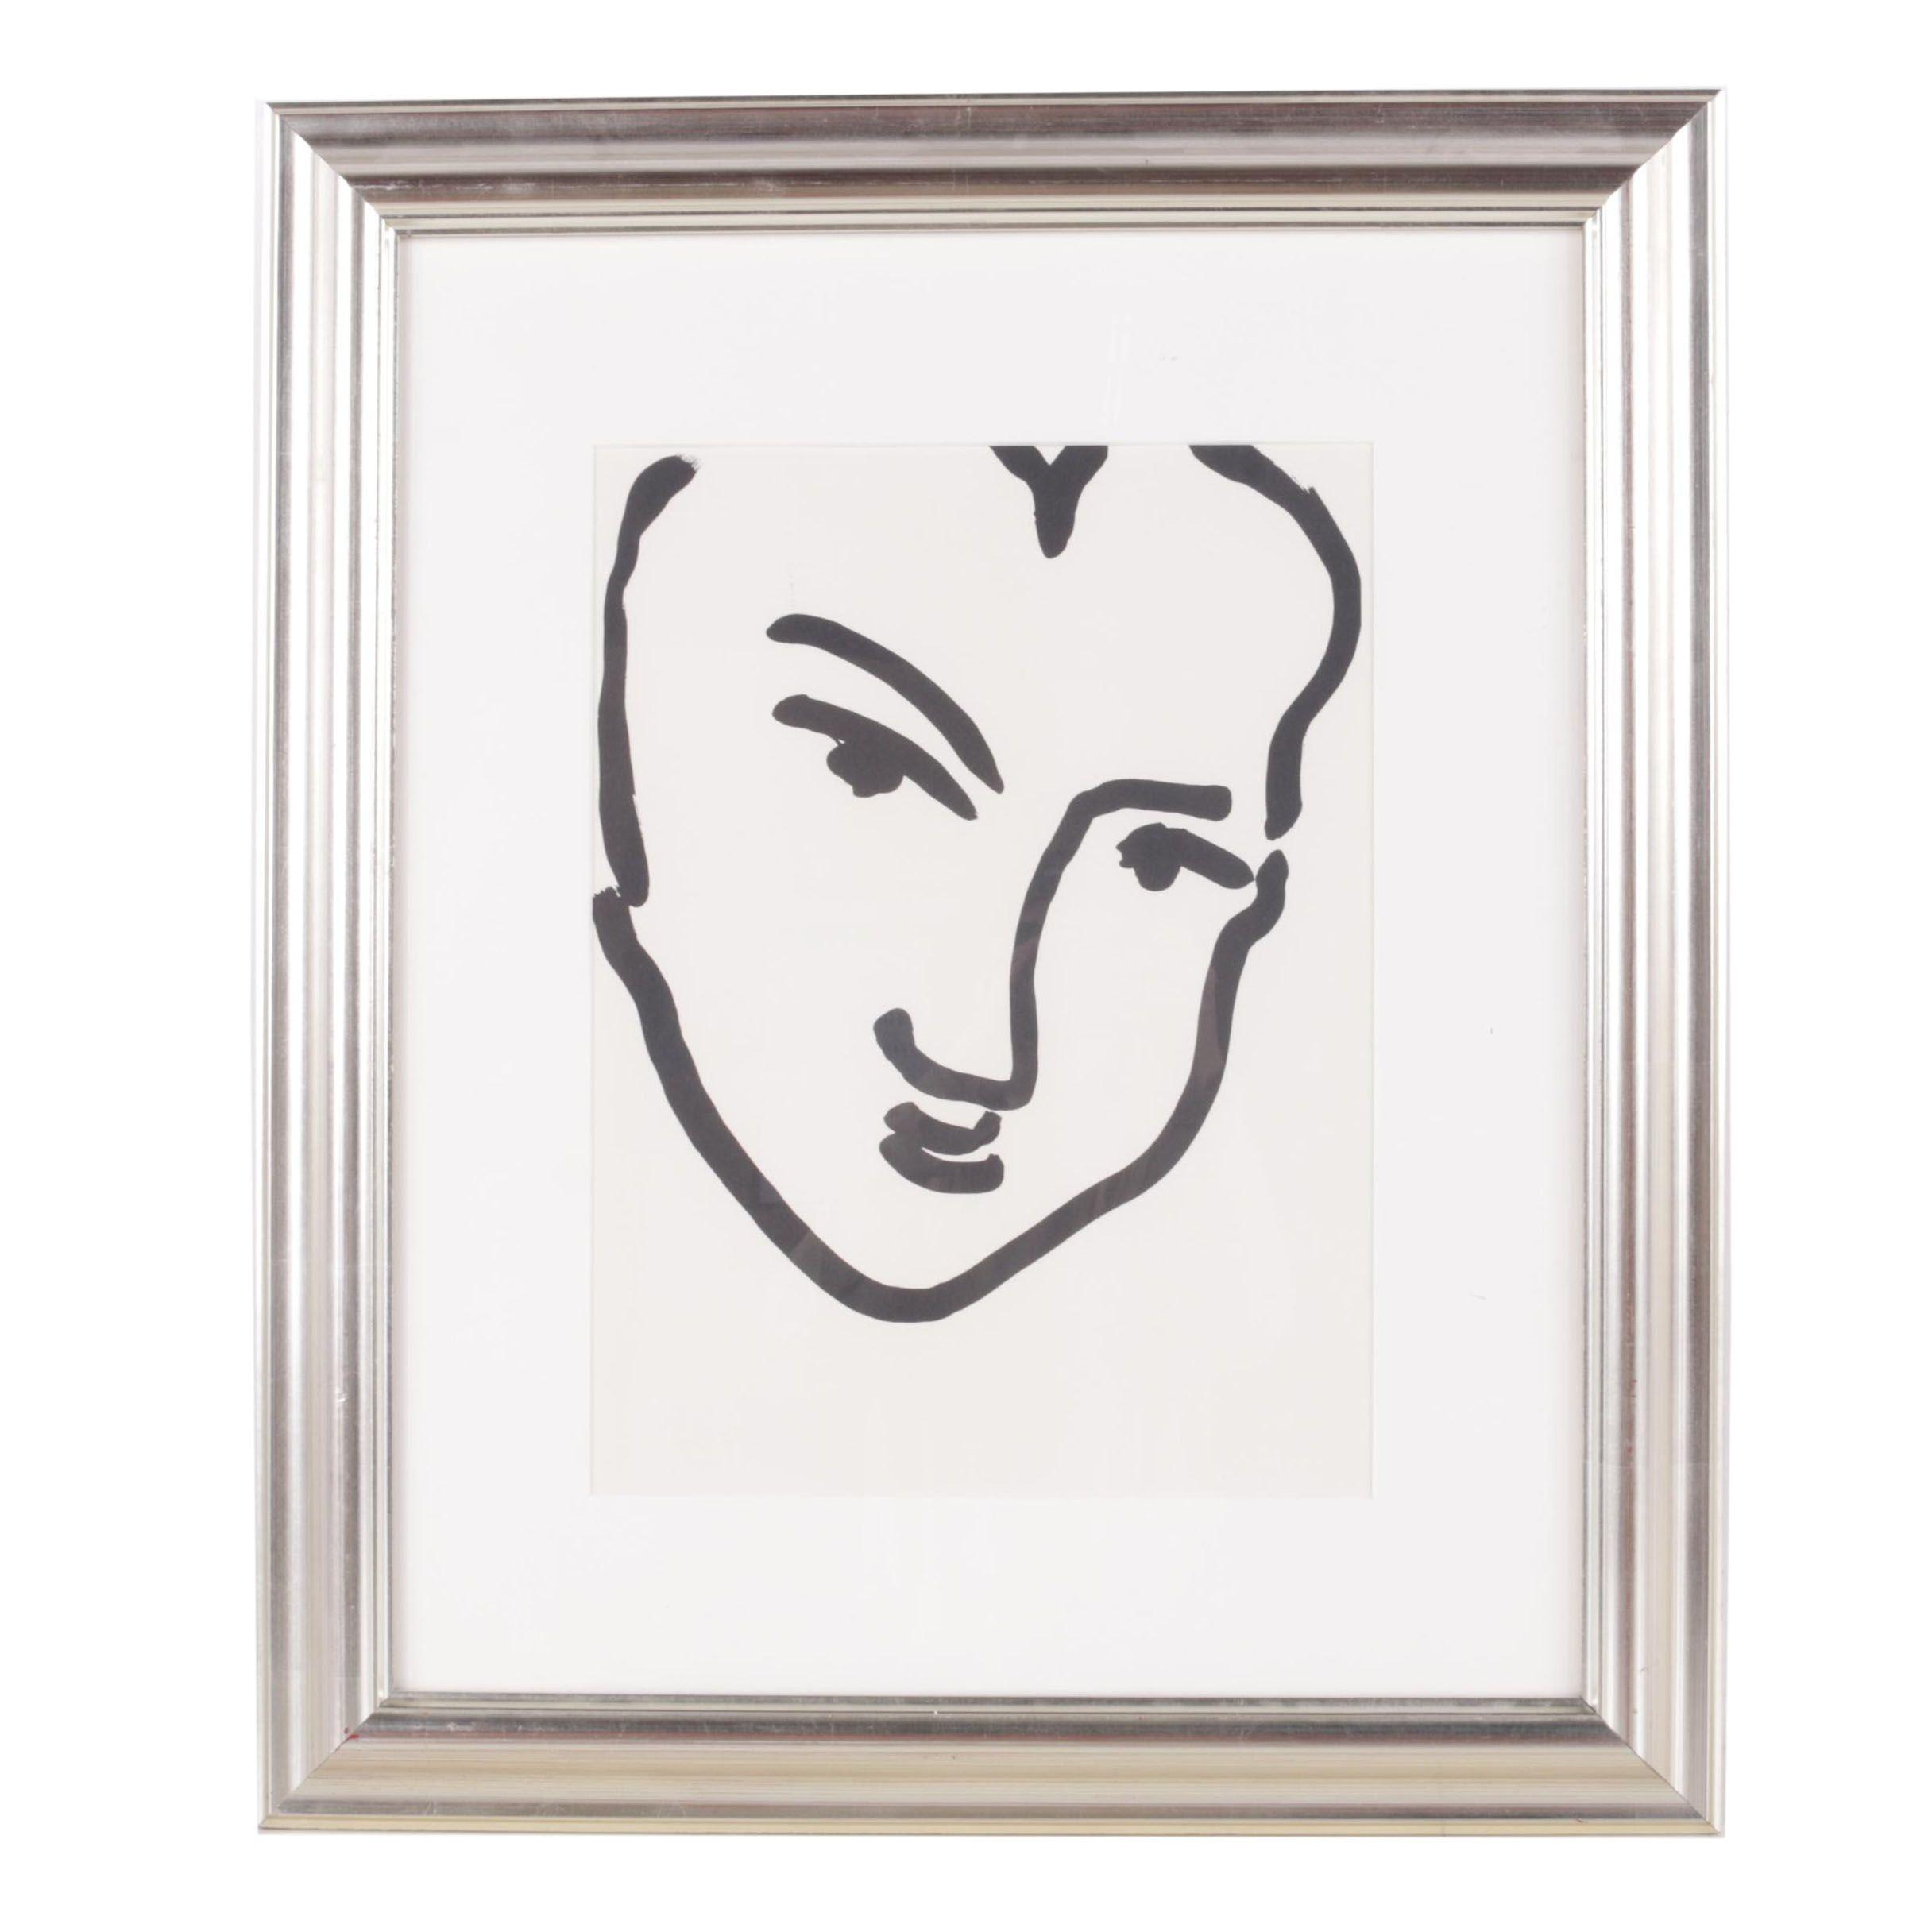 "Lithograph on Paper After Henri Matisse ""Nadia au Visage Penche"""